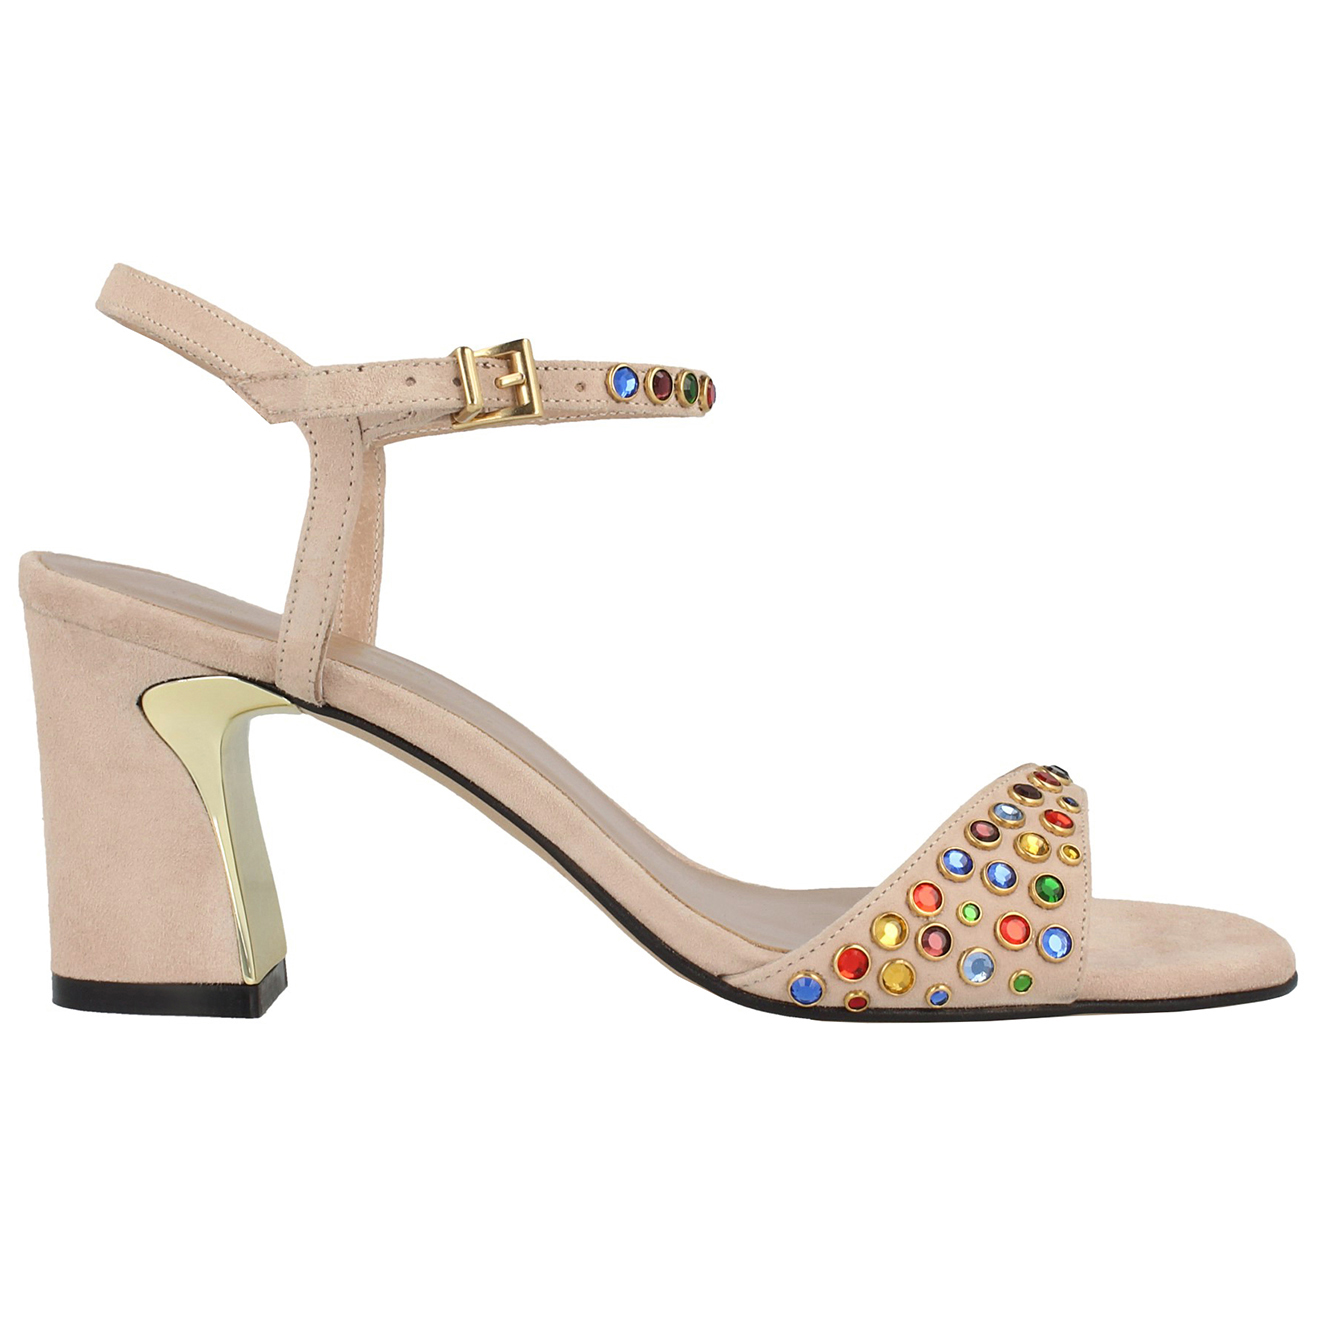 Sandales en cuir nude Talon 7cm - Roberto Botella - Modalova